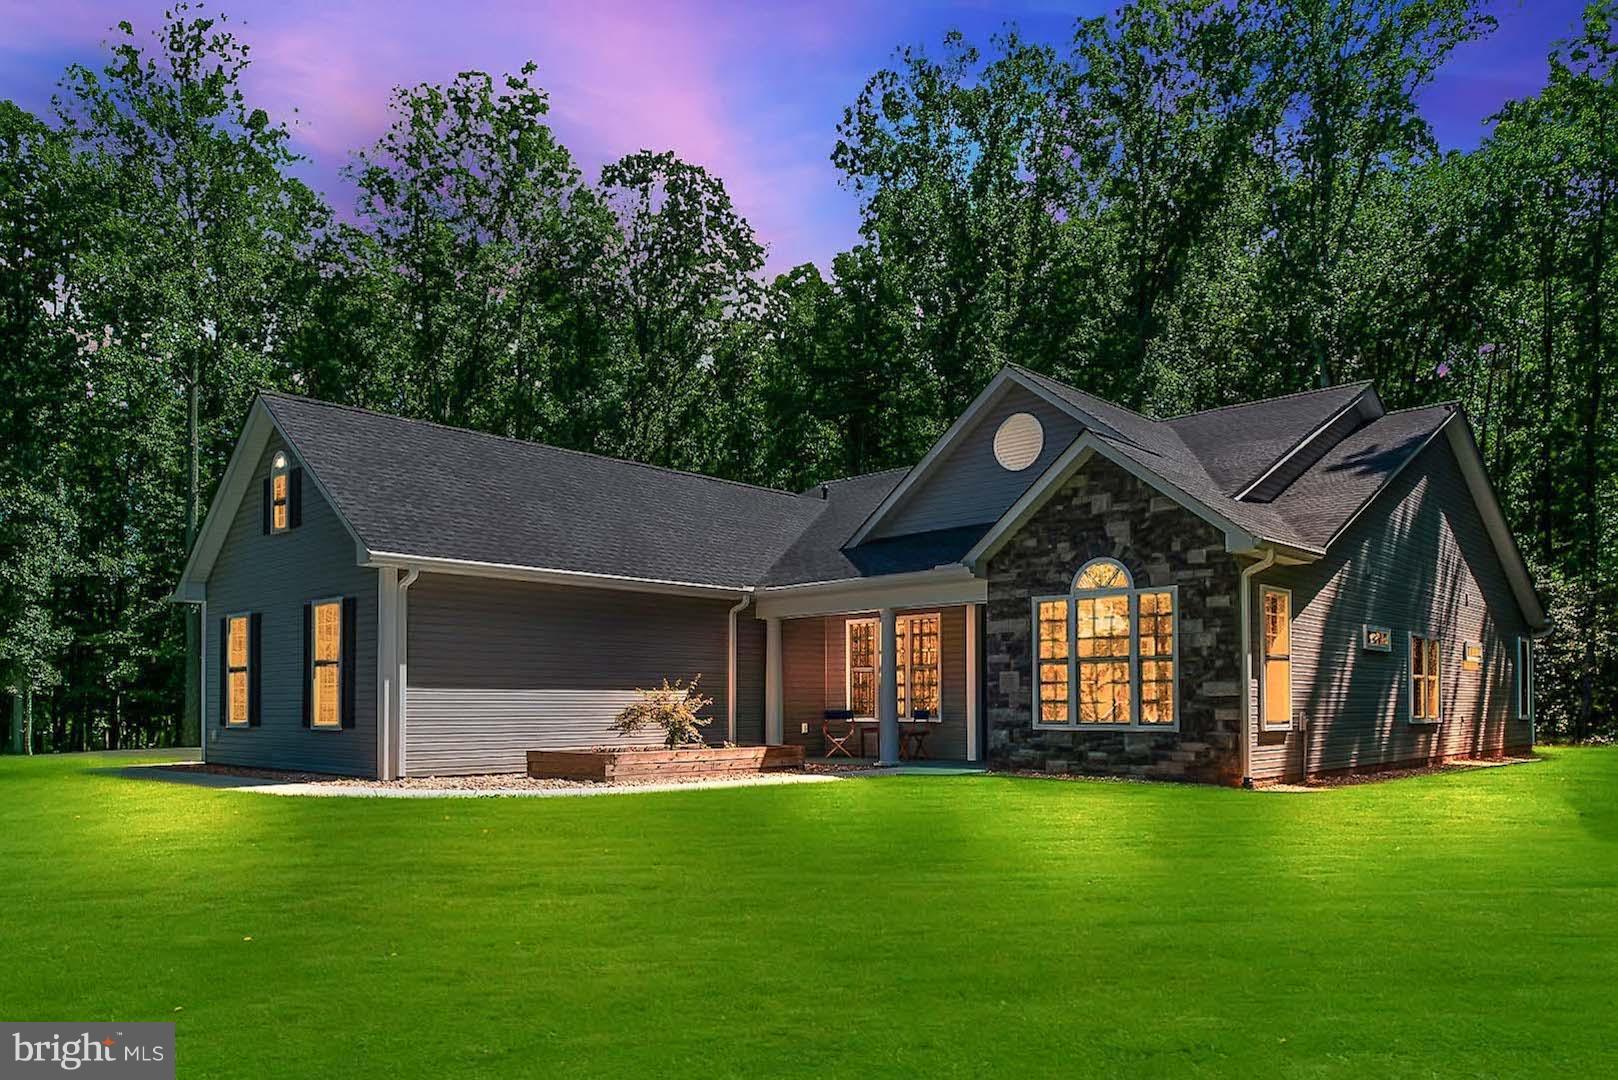 492 OLD HOUSE ROAD, BUMPASS, VA 23024